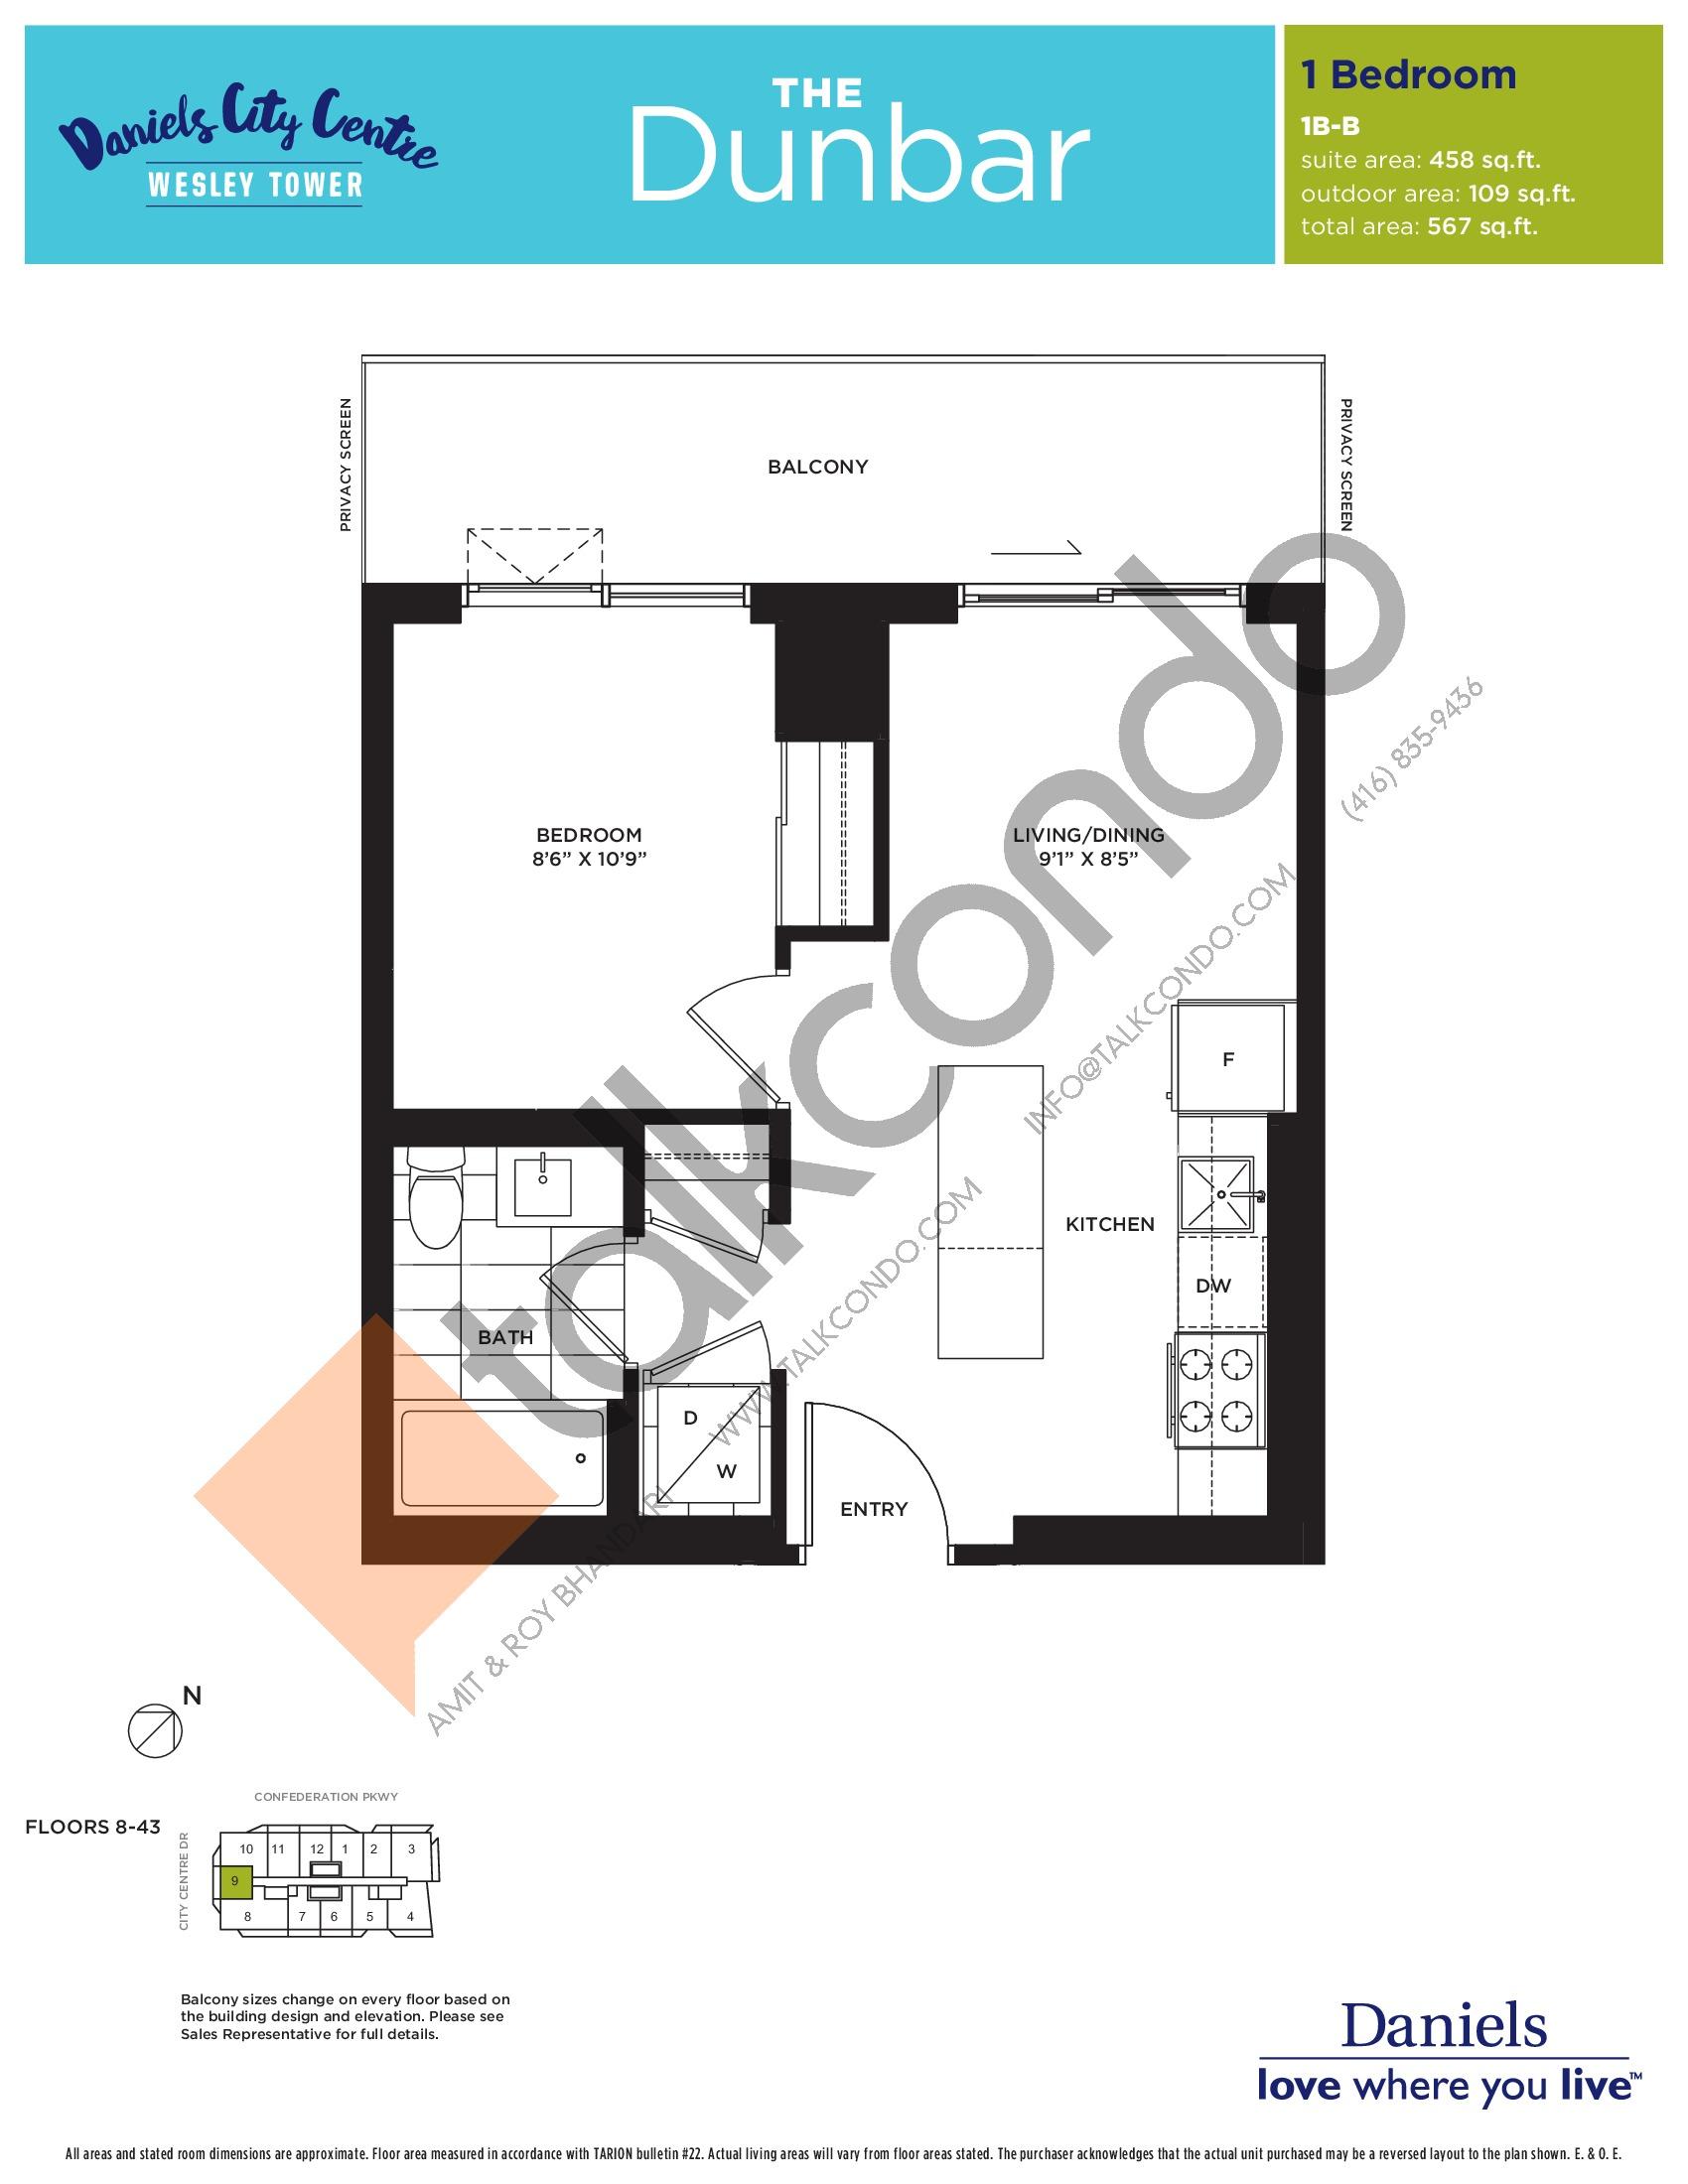 The Dunbar Floor Plan at The Wesley Tower at Daniels City Centre Condos - 458 sq.ft